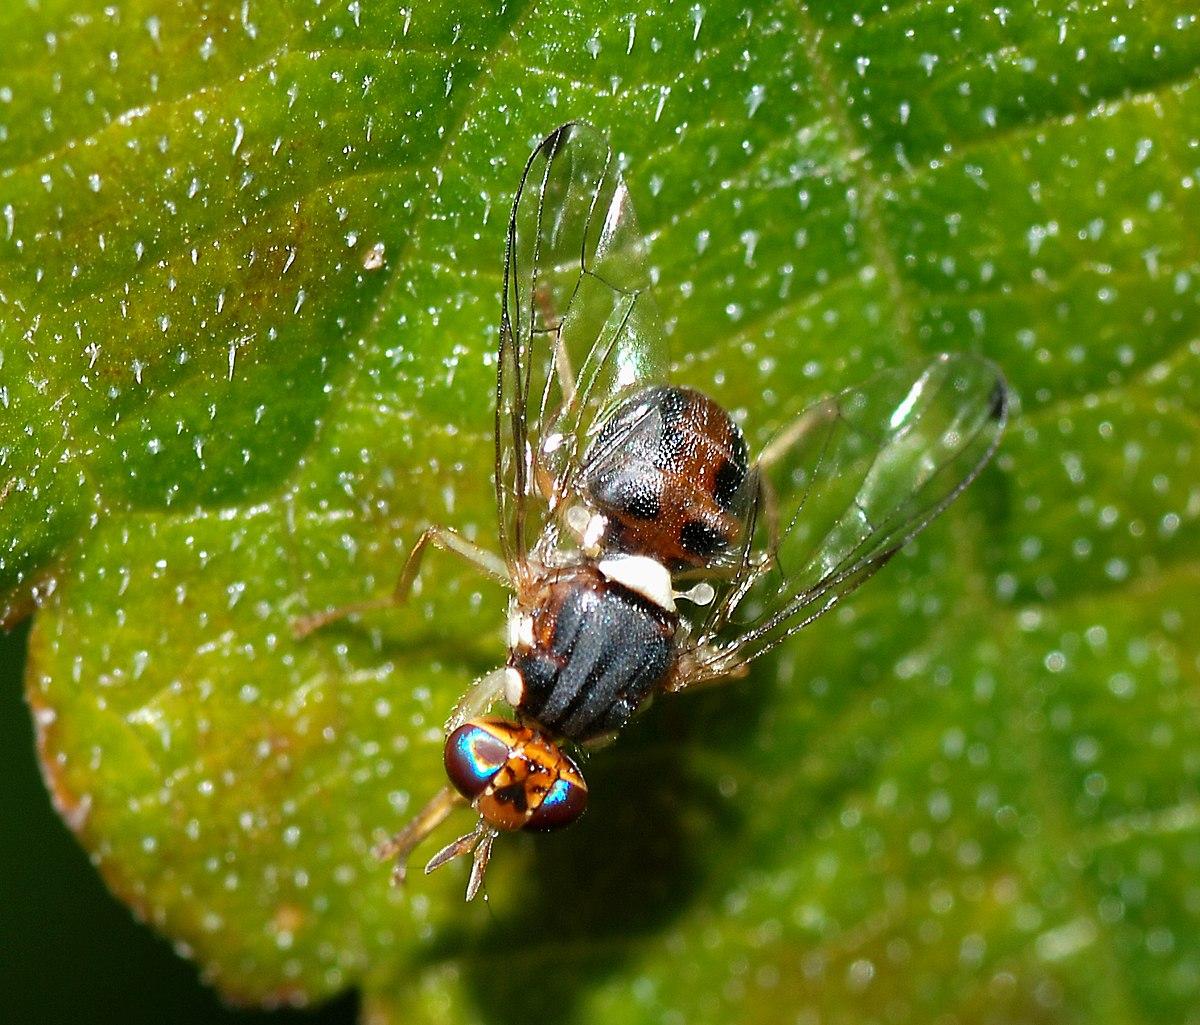 Bactrocera oleae wikipedia - Mosche verdi ...